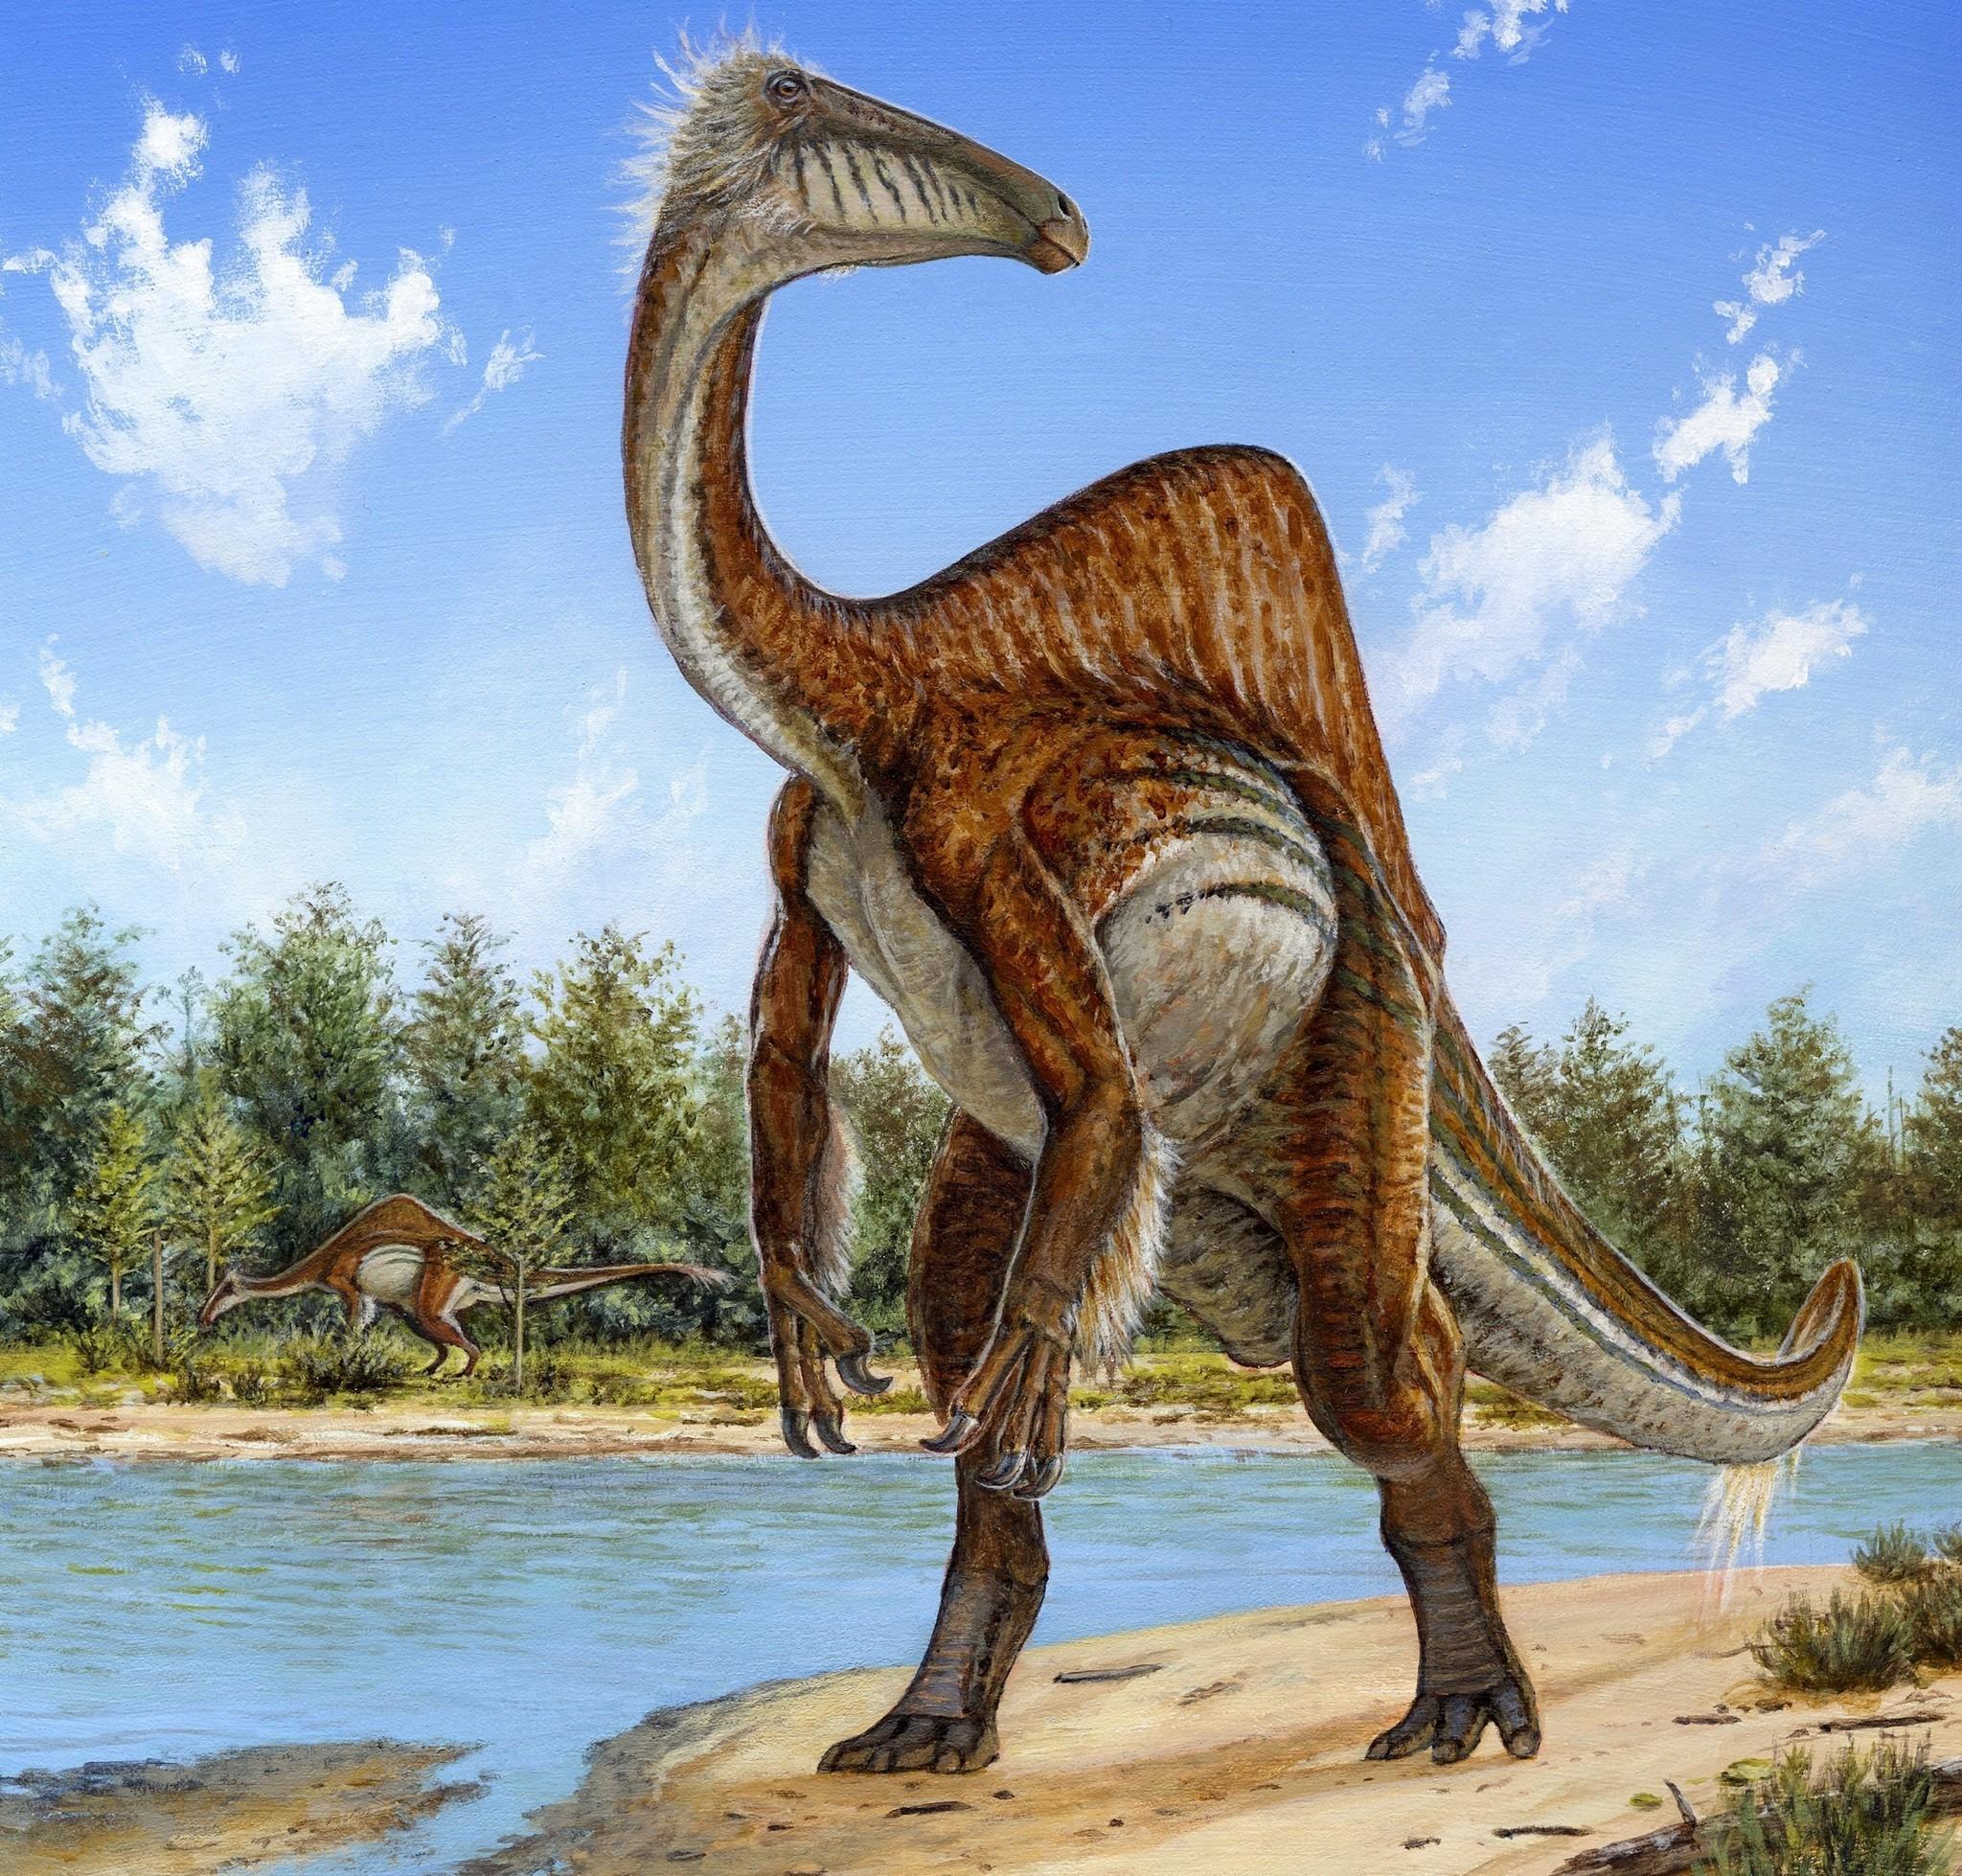 Semana -1447 - 2 Deinocheirus mirificus